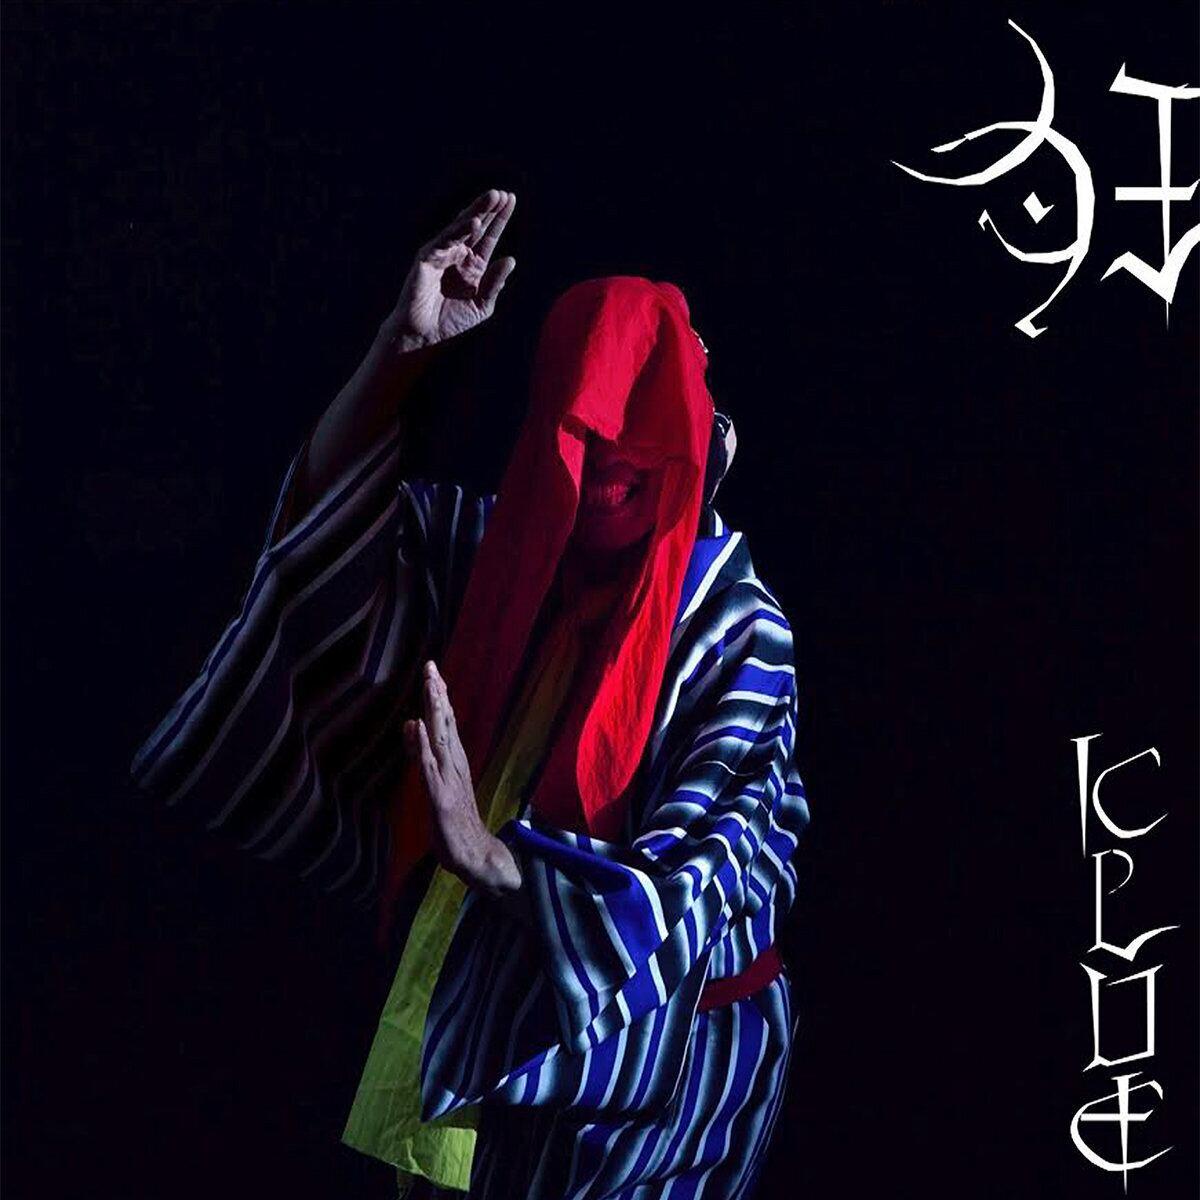 GEZAN - 狂 (KLUE) (CD)